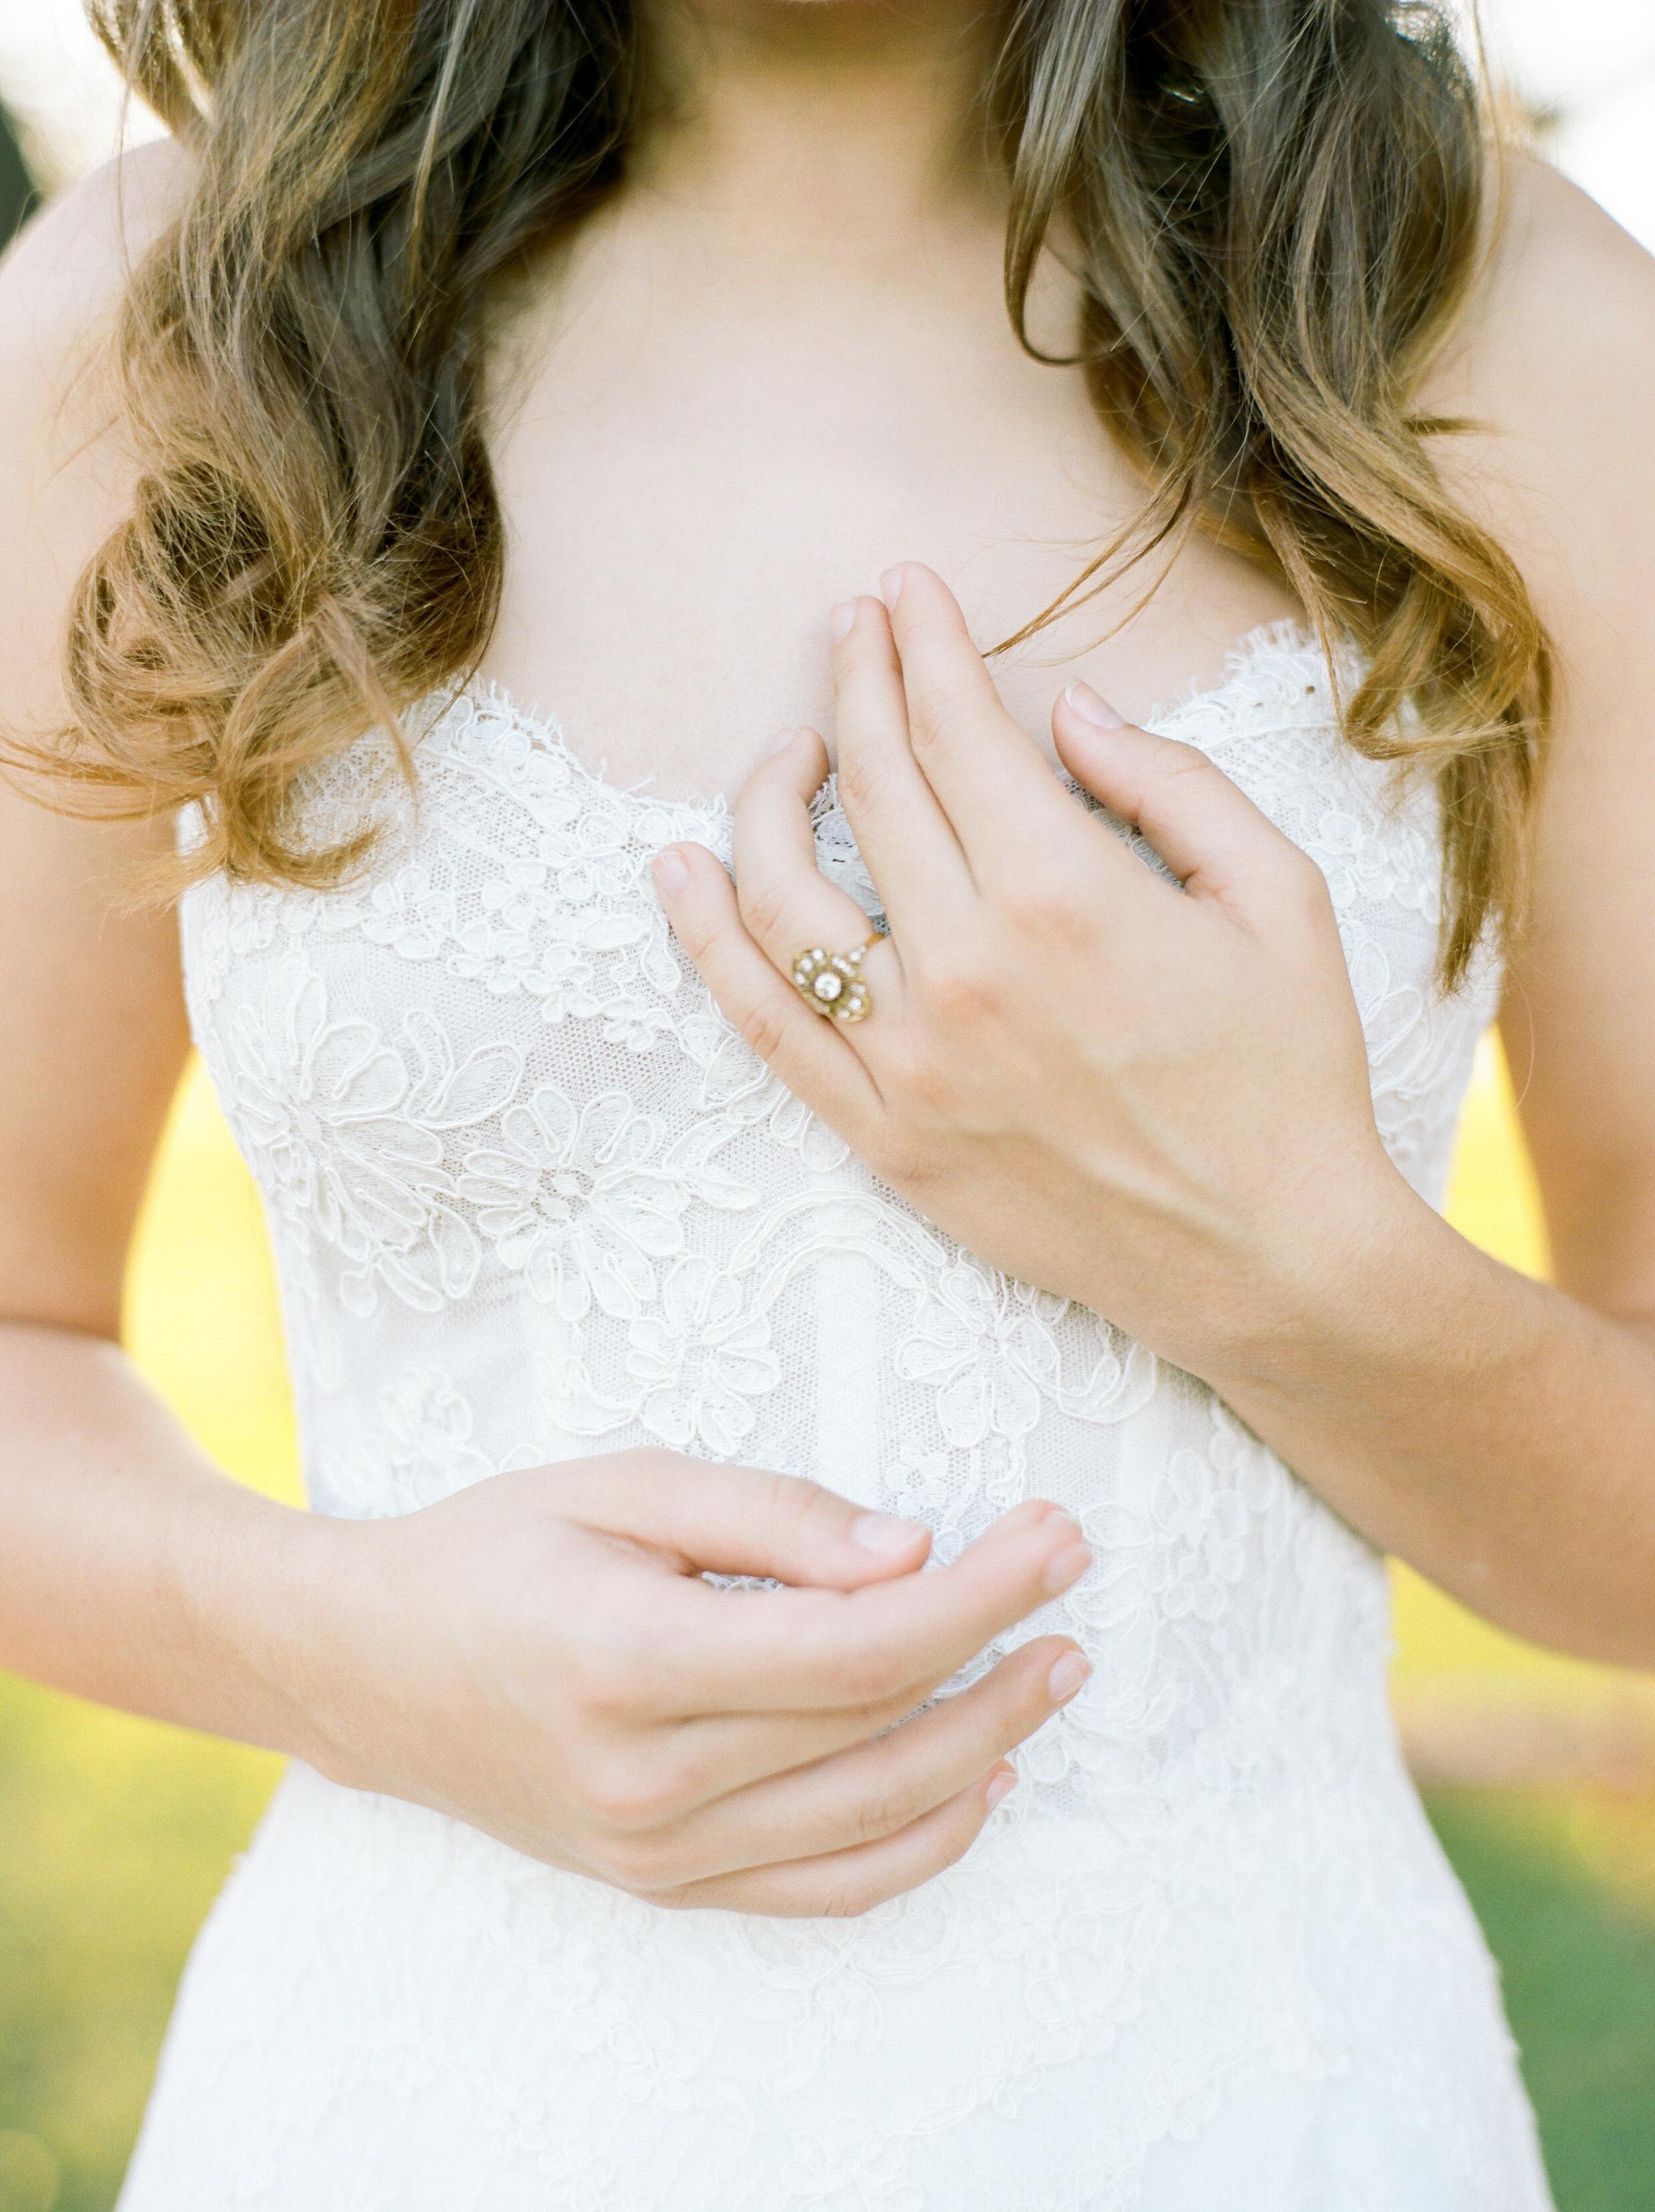 Top-Houston-Wedding-Photographer-Dana-Fernandez-Photography-The-Clubs-At-Houston-Oaks-Country-Club-Belle-Events-Film-Fine-Art-Destination-6.jpg